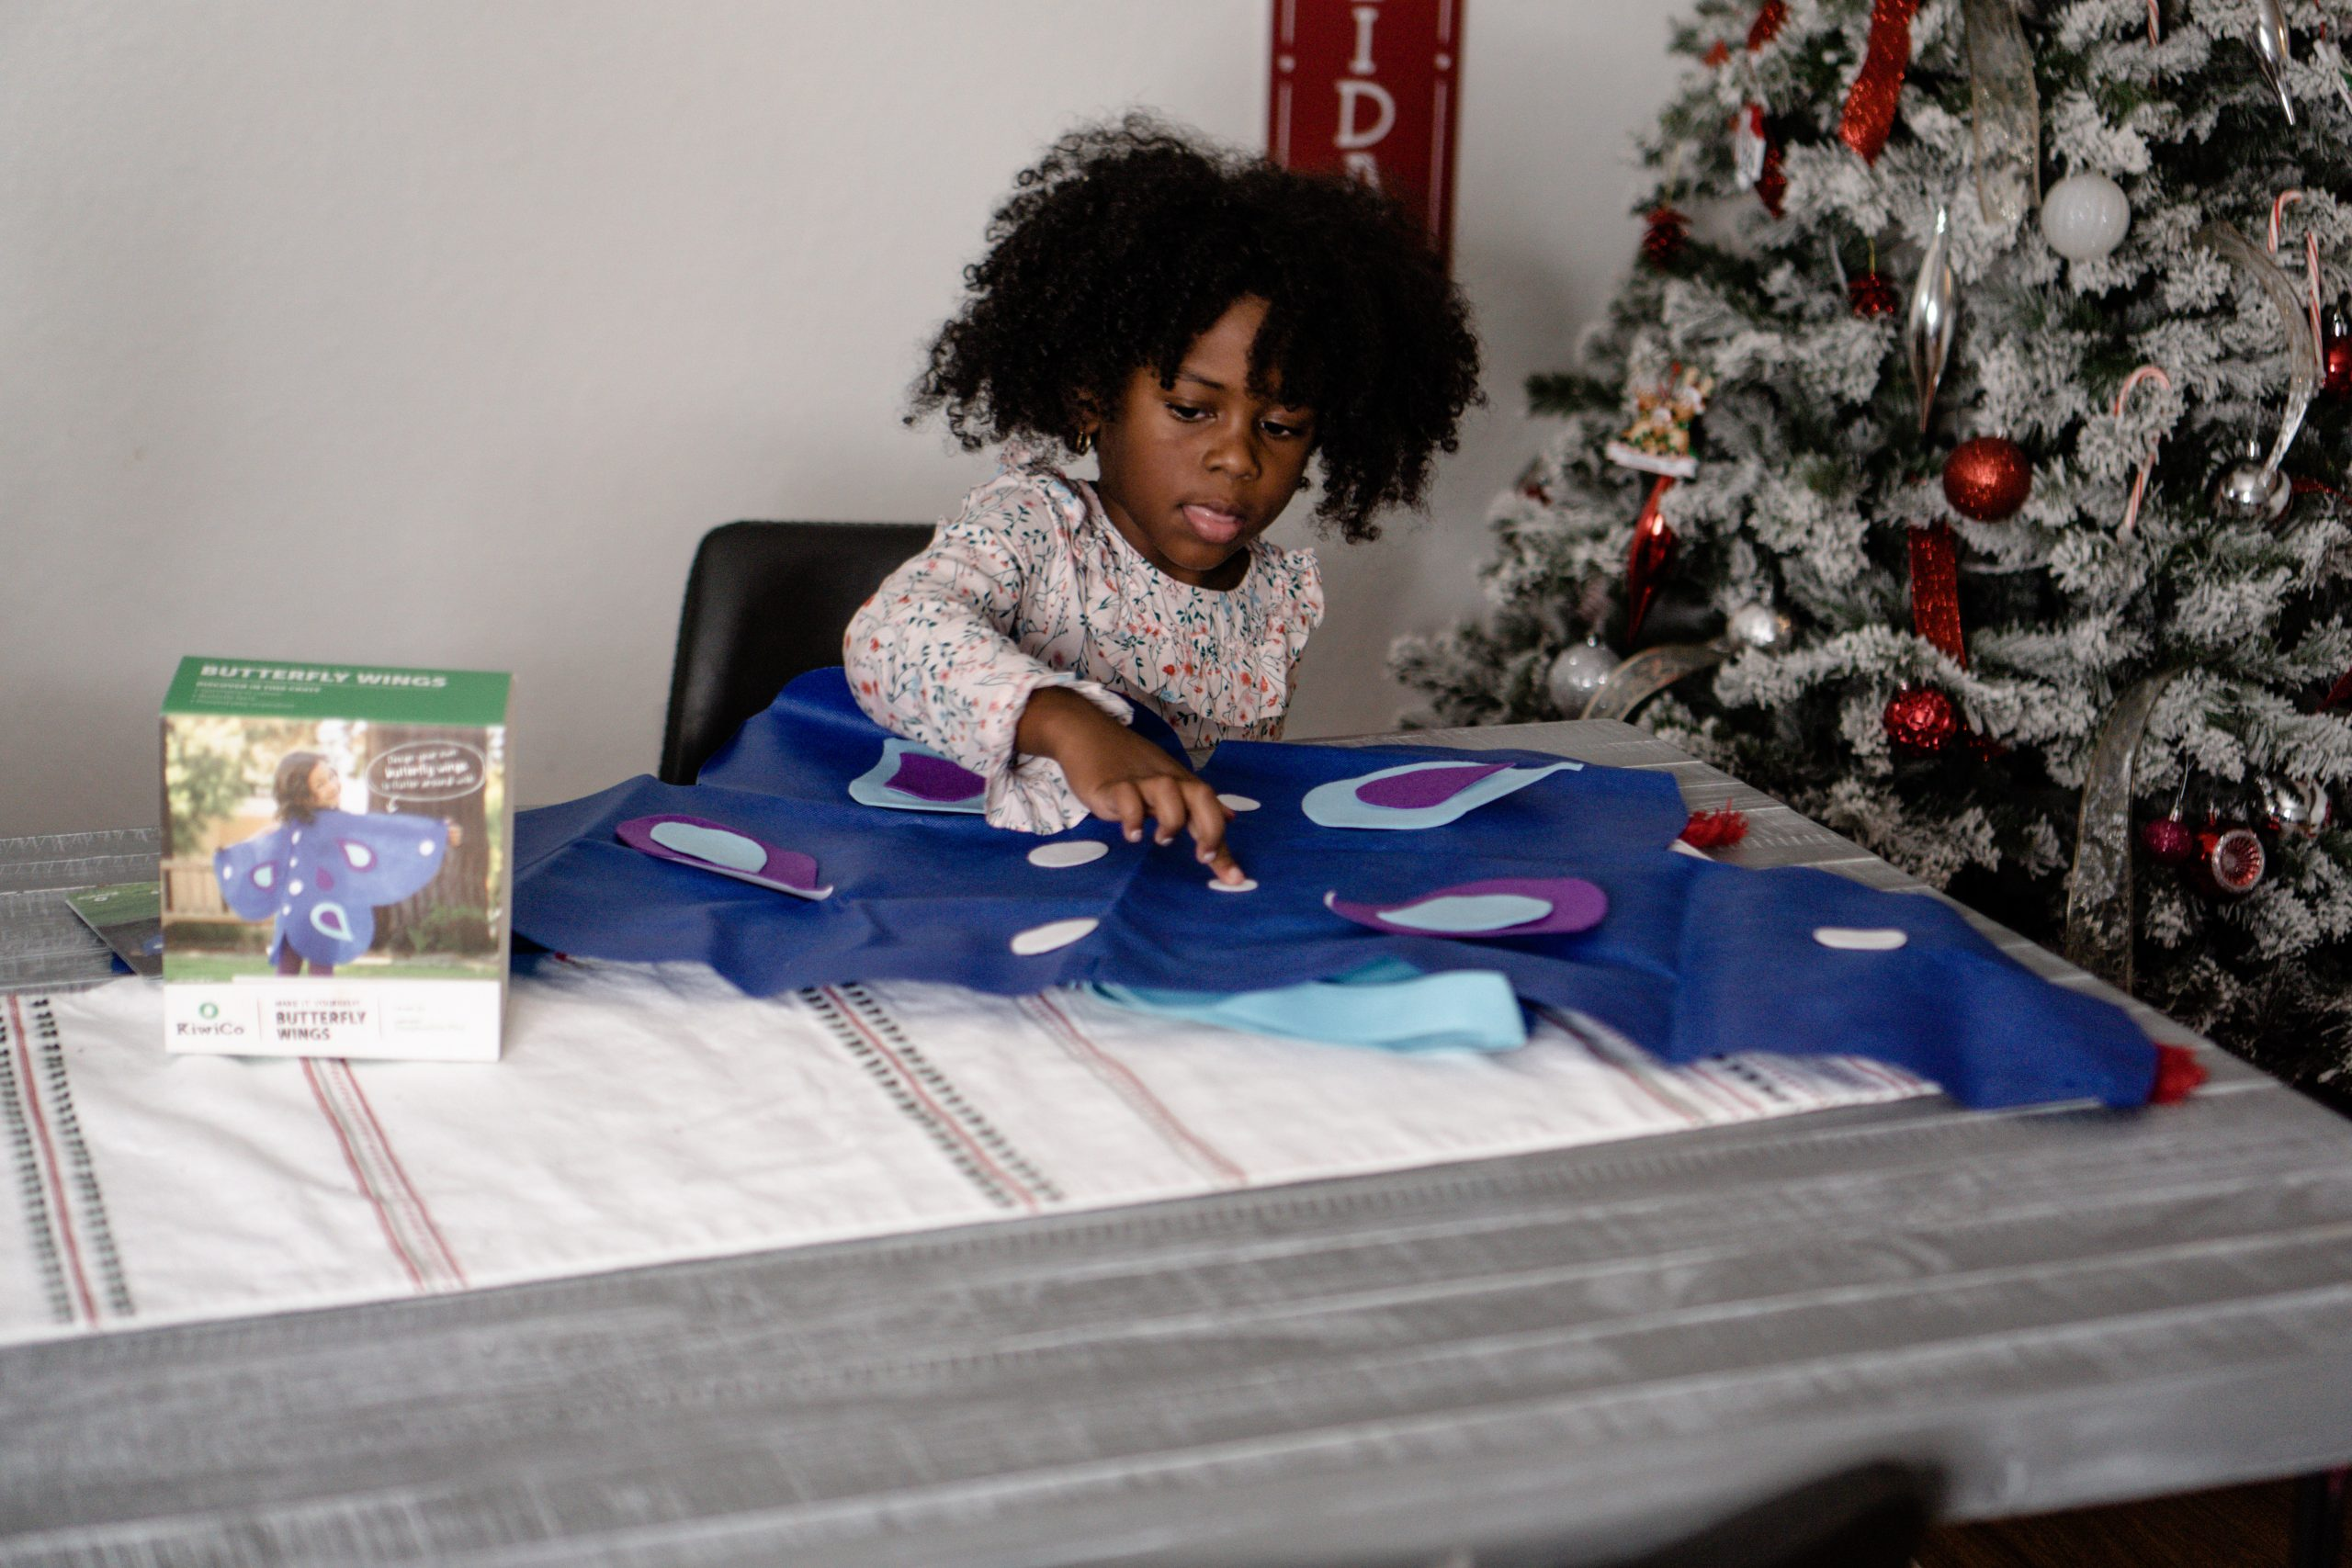 Hand-on, Scree Free Gift Idea